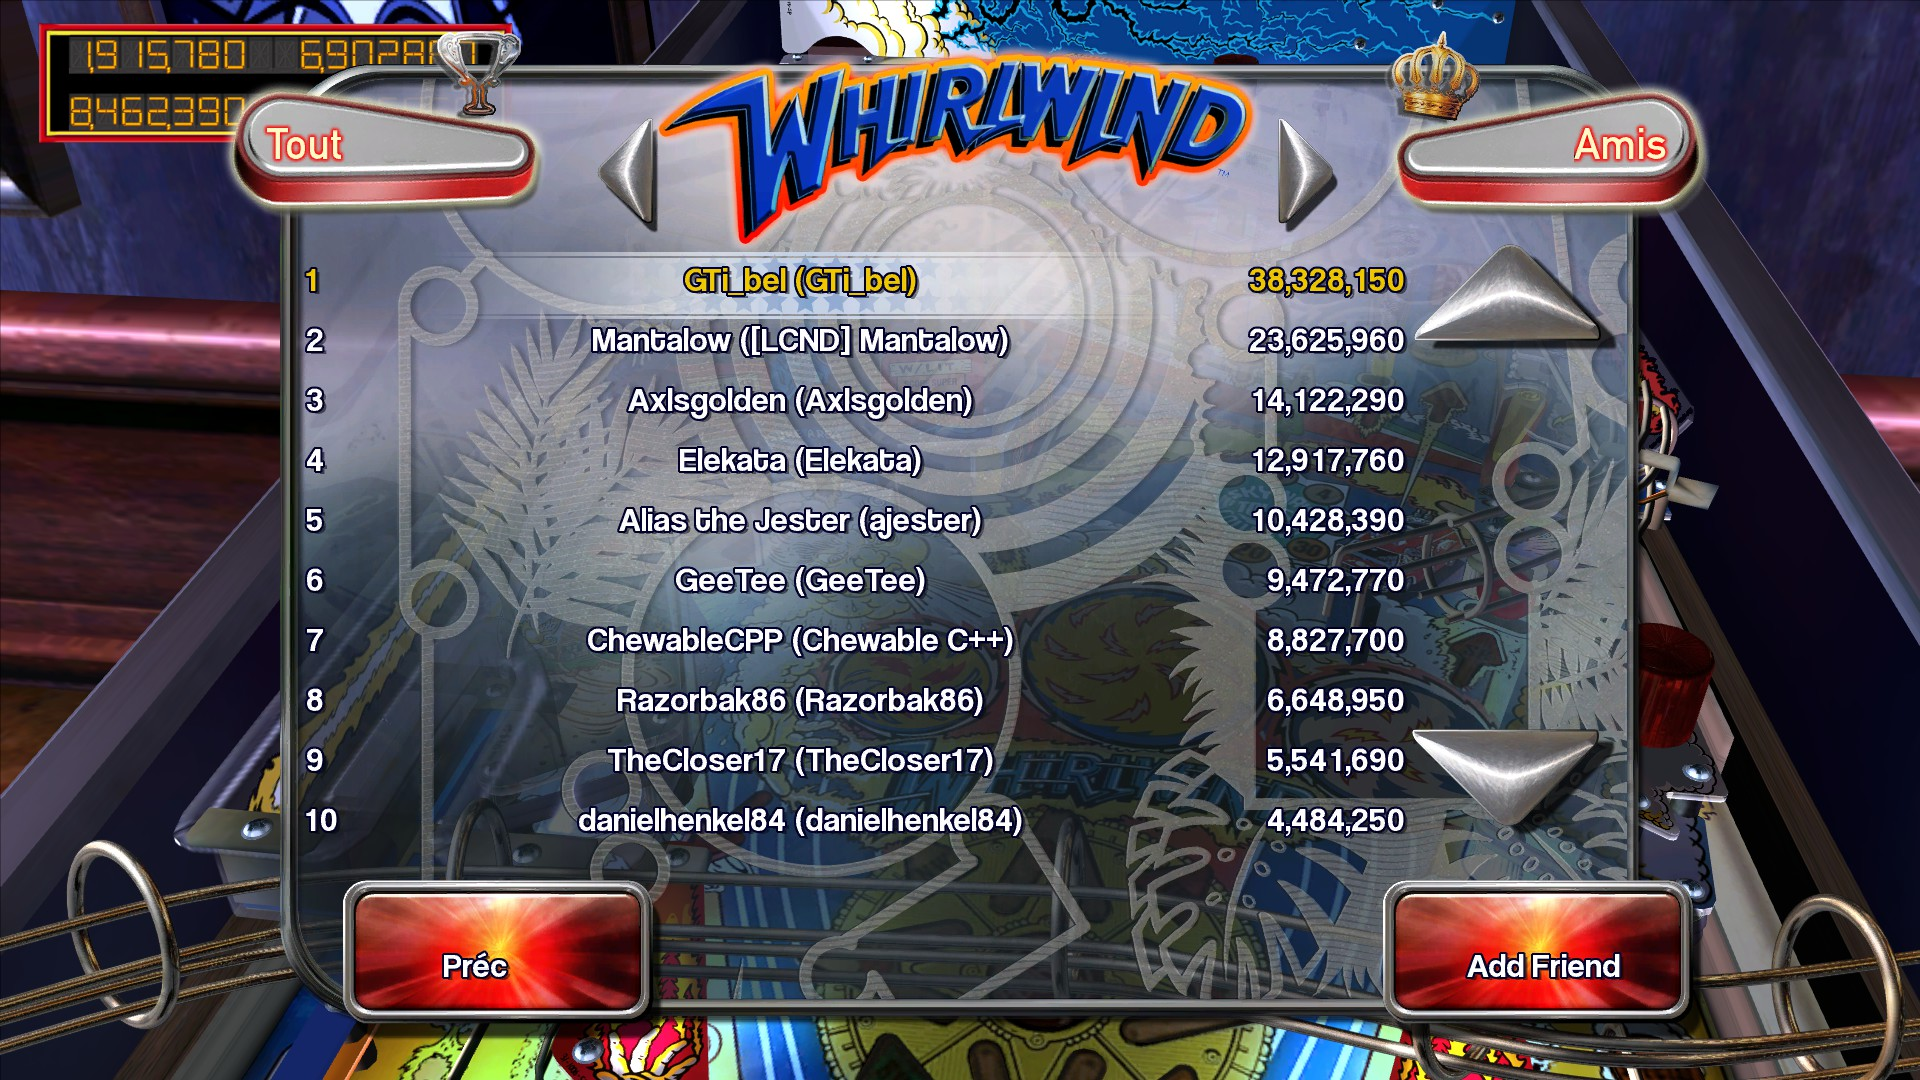 Mantalow: Pinball Arcade: Whirlwind (PC) 23,625,960 points on 2015-07-01 15:28:18